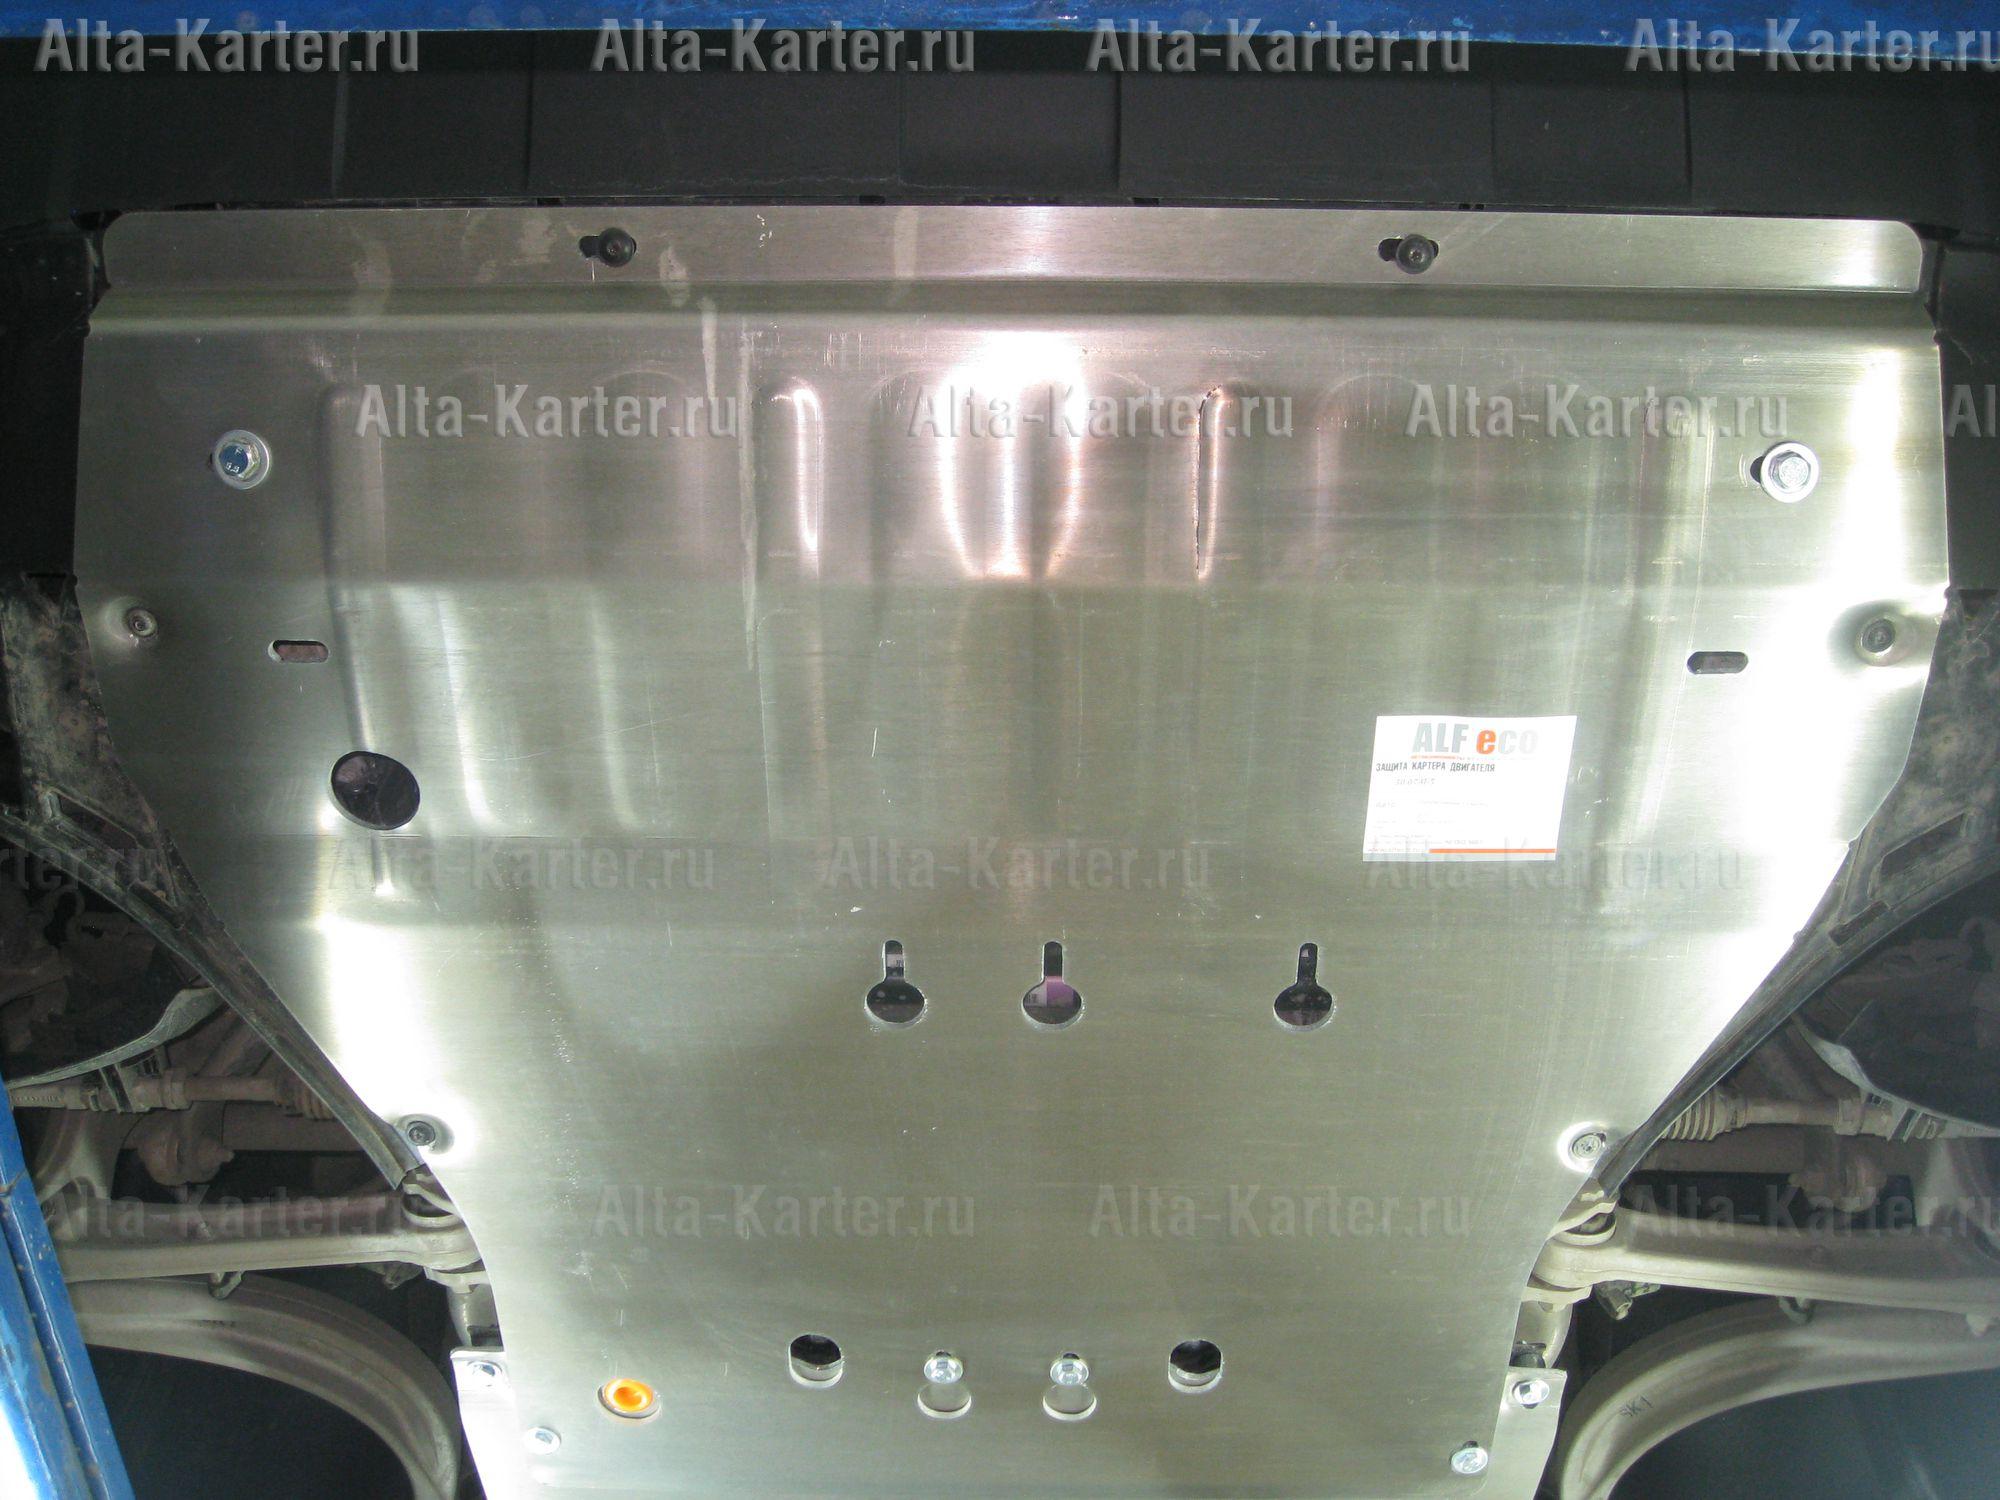 Защита Alfeco для картера и КПП Porsche Cayenne III 2017-2021. Артикул ALF.50.07